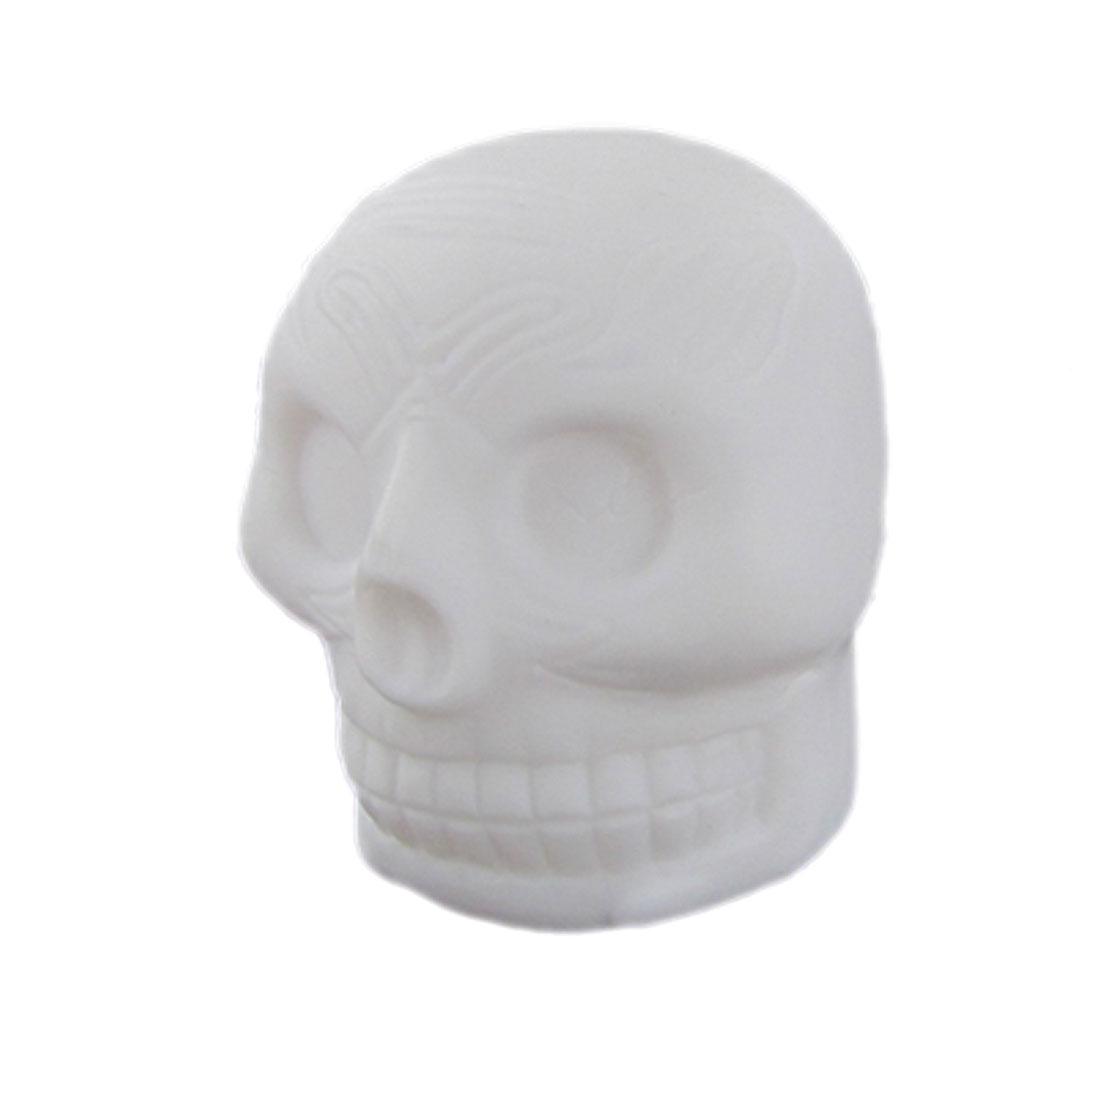 White Skull Head Shape 7 Colors LED Light Lamp Decor